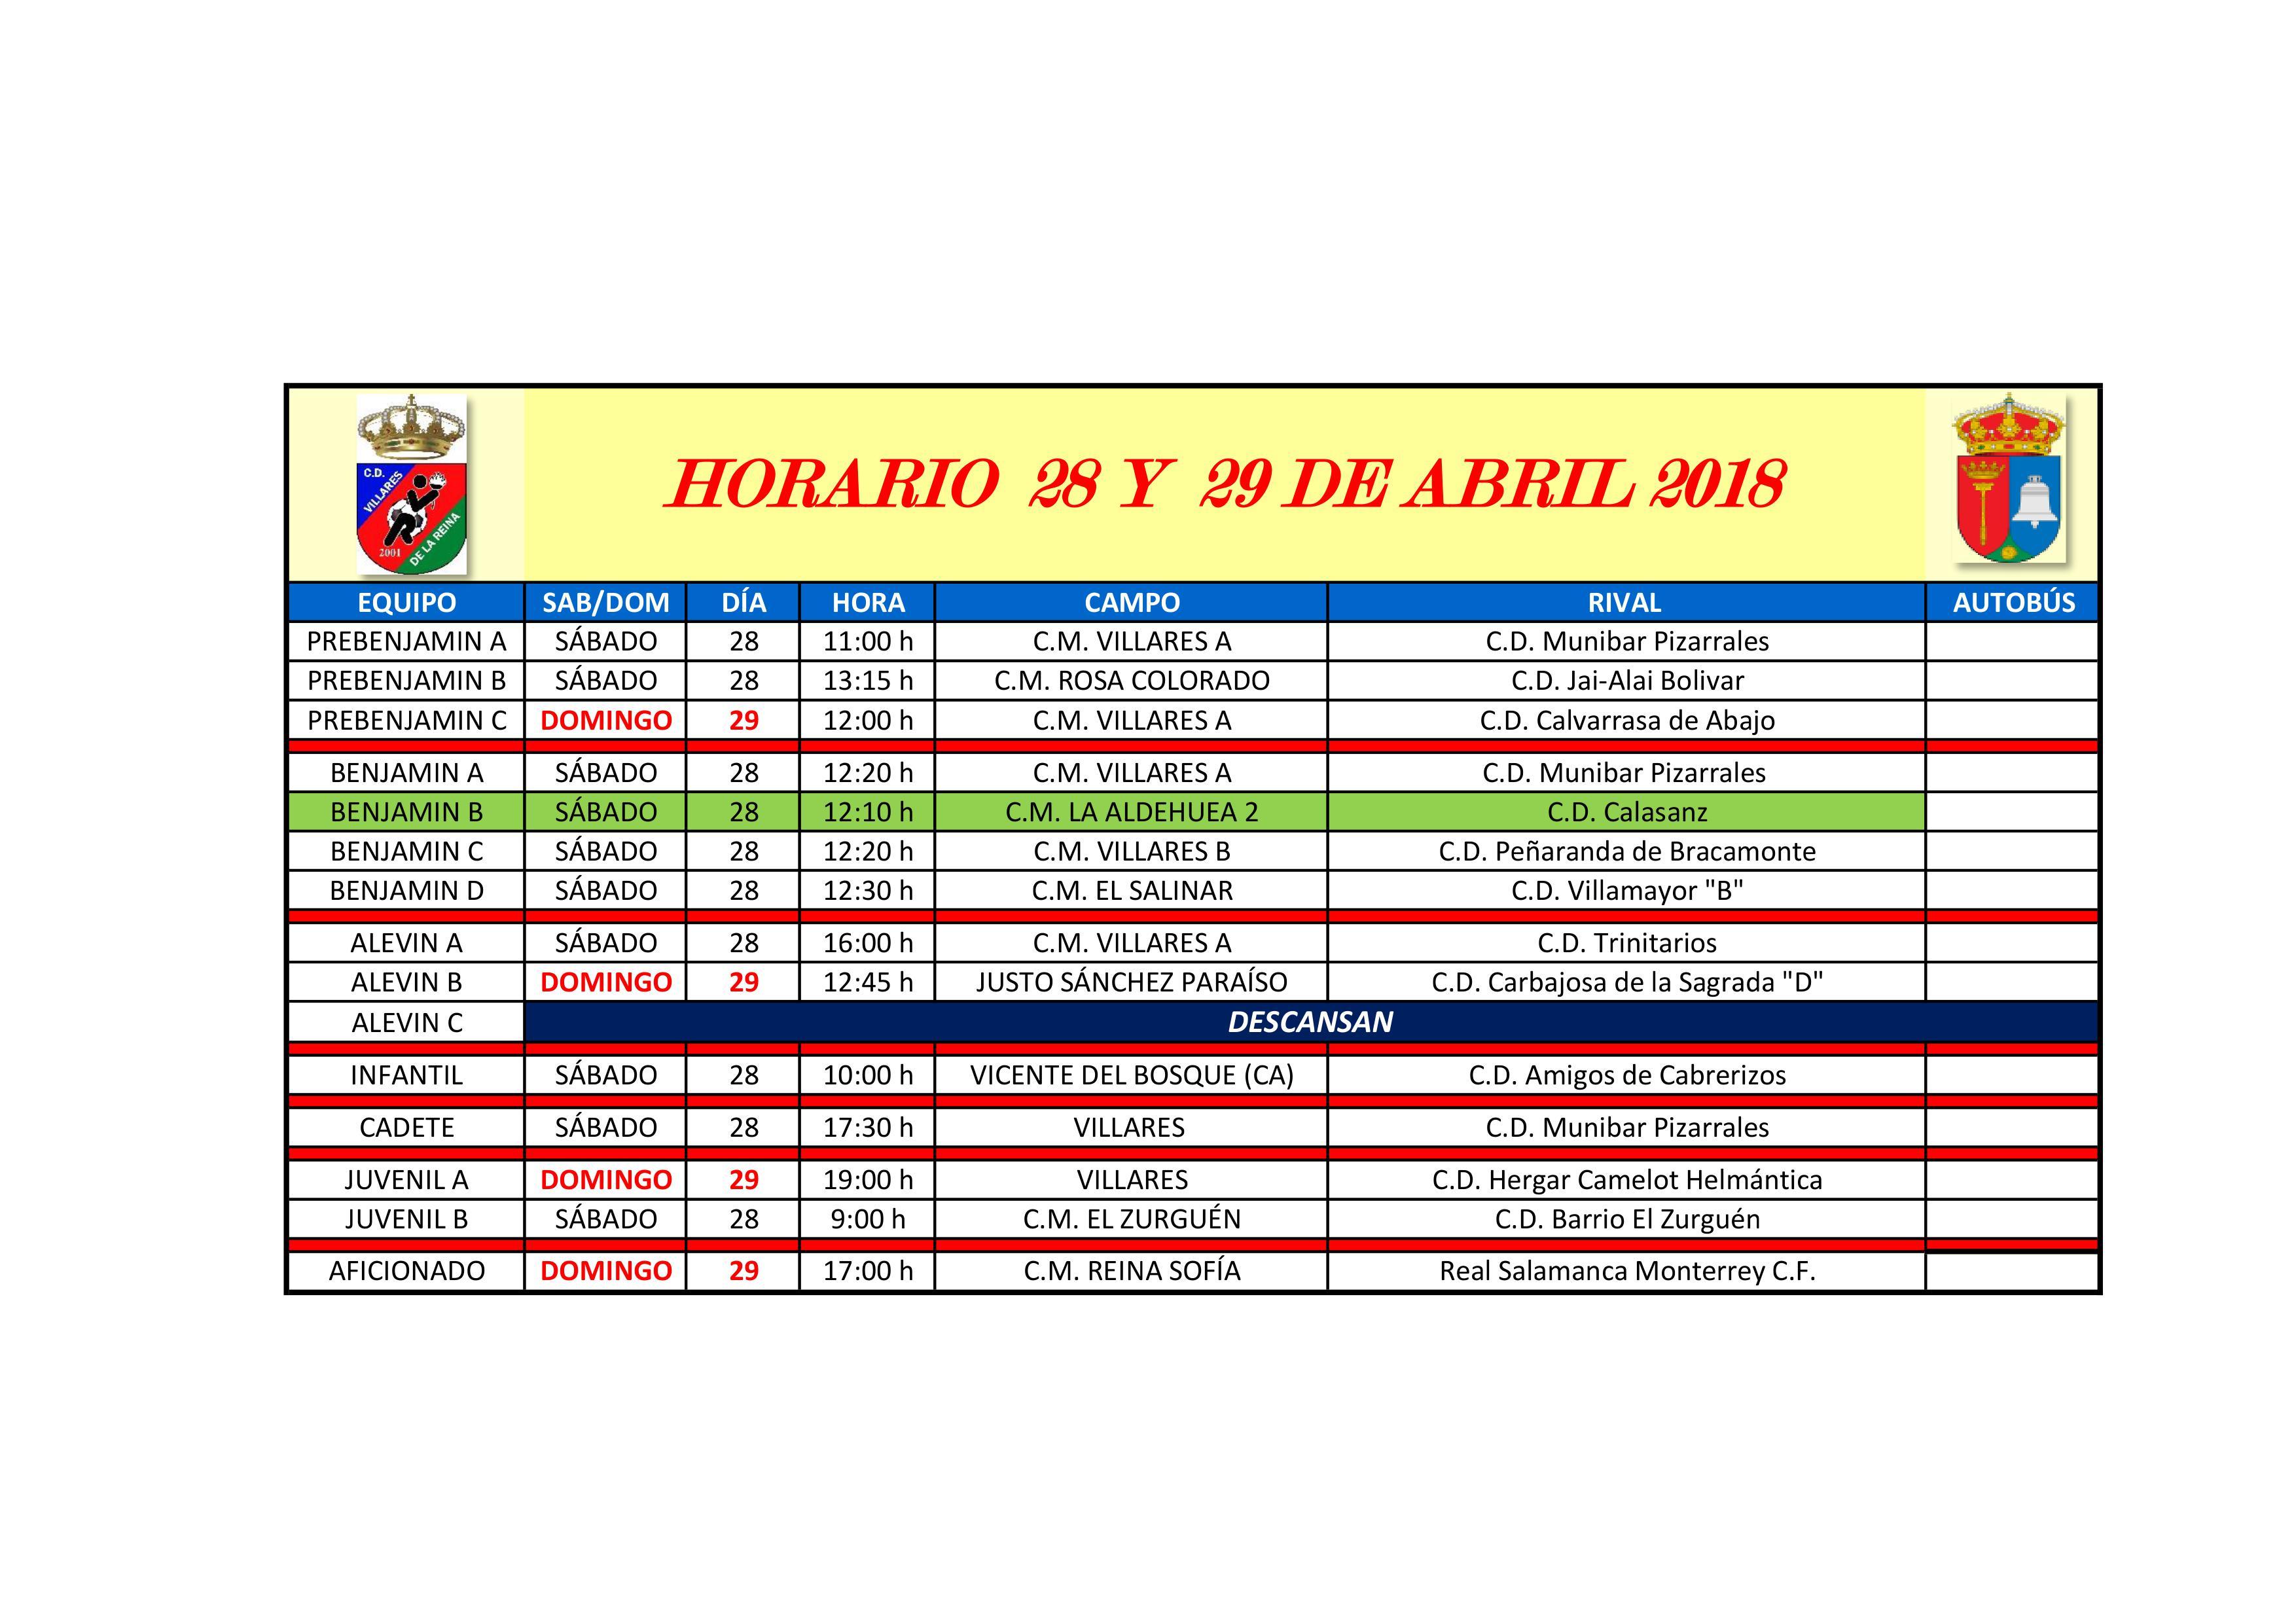 Horarios de futbol de 28-29 de Abril